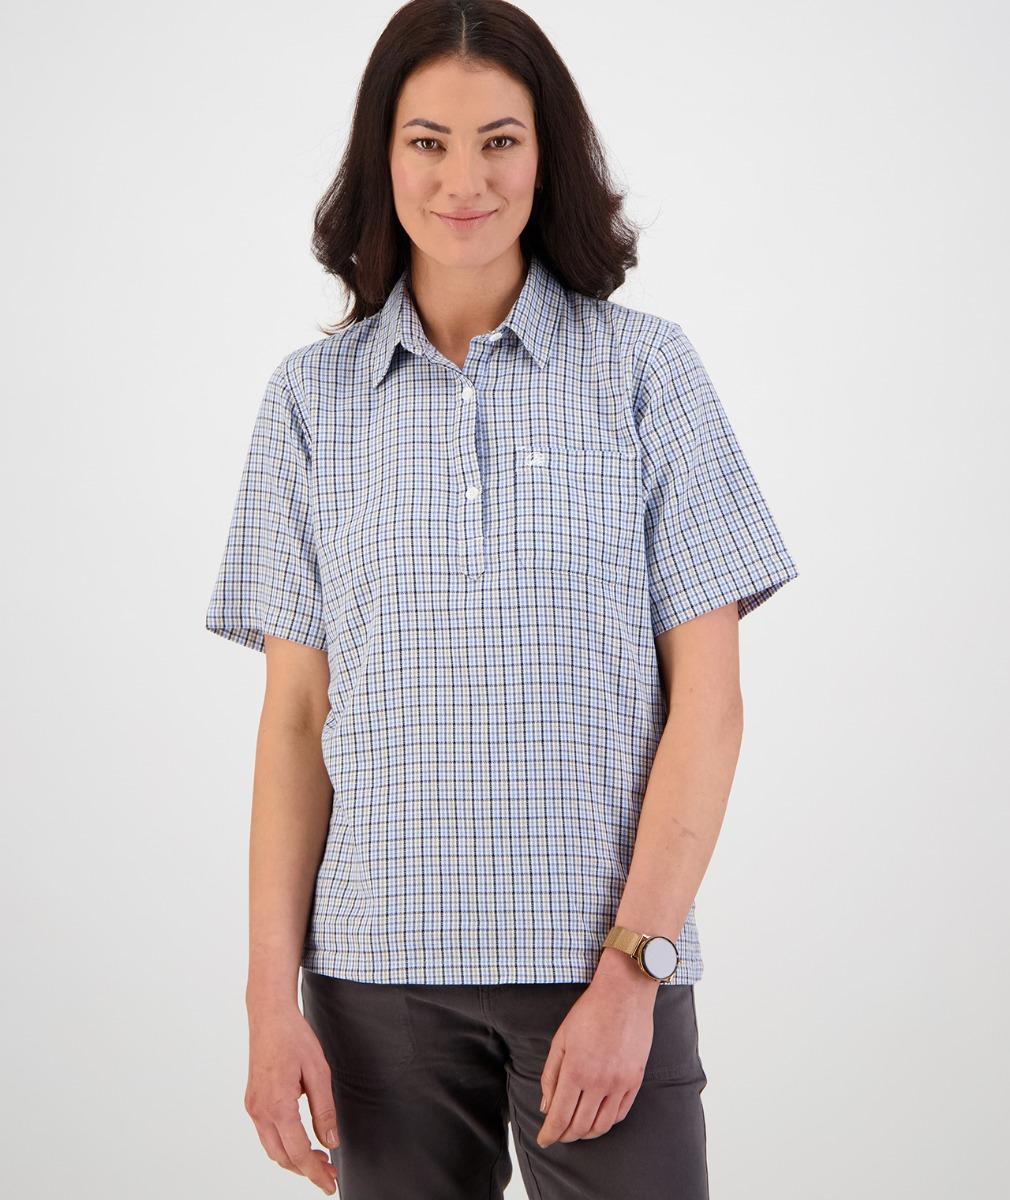 Swanndri Women's Tasman 100% Cotton Short Sleeve Shirt in Light Blue/Sage/Navy